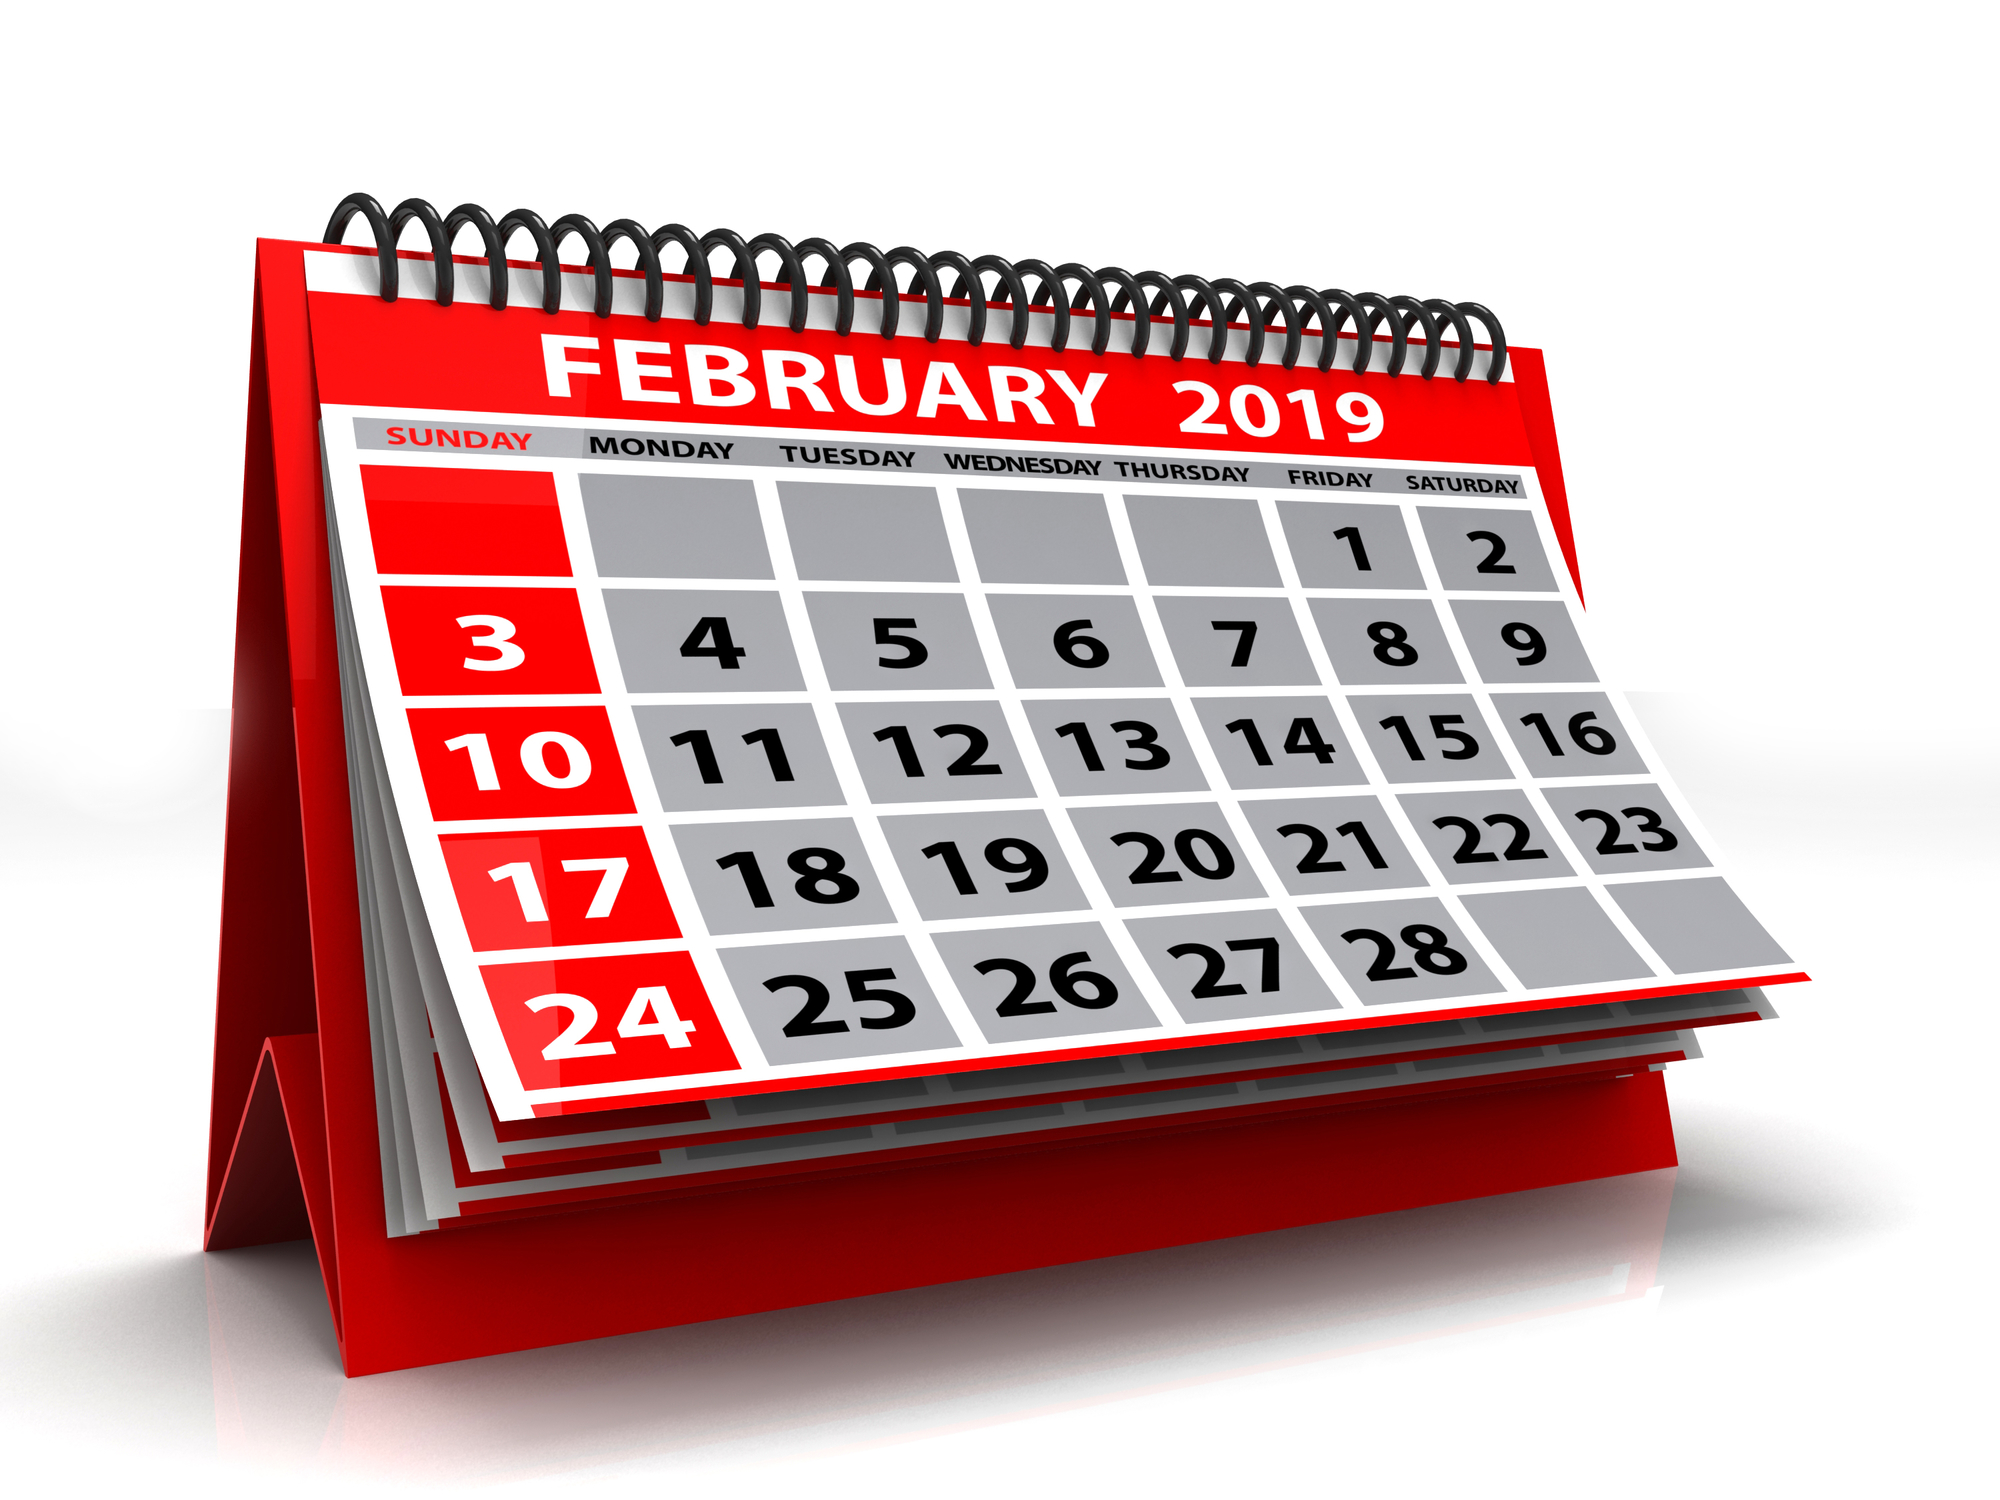 0e2c938b3fff (Upd) Σημαντικές φορολογικές και λοιπές υποχρεώσεις μηνός Φεβρουαρίου 2019